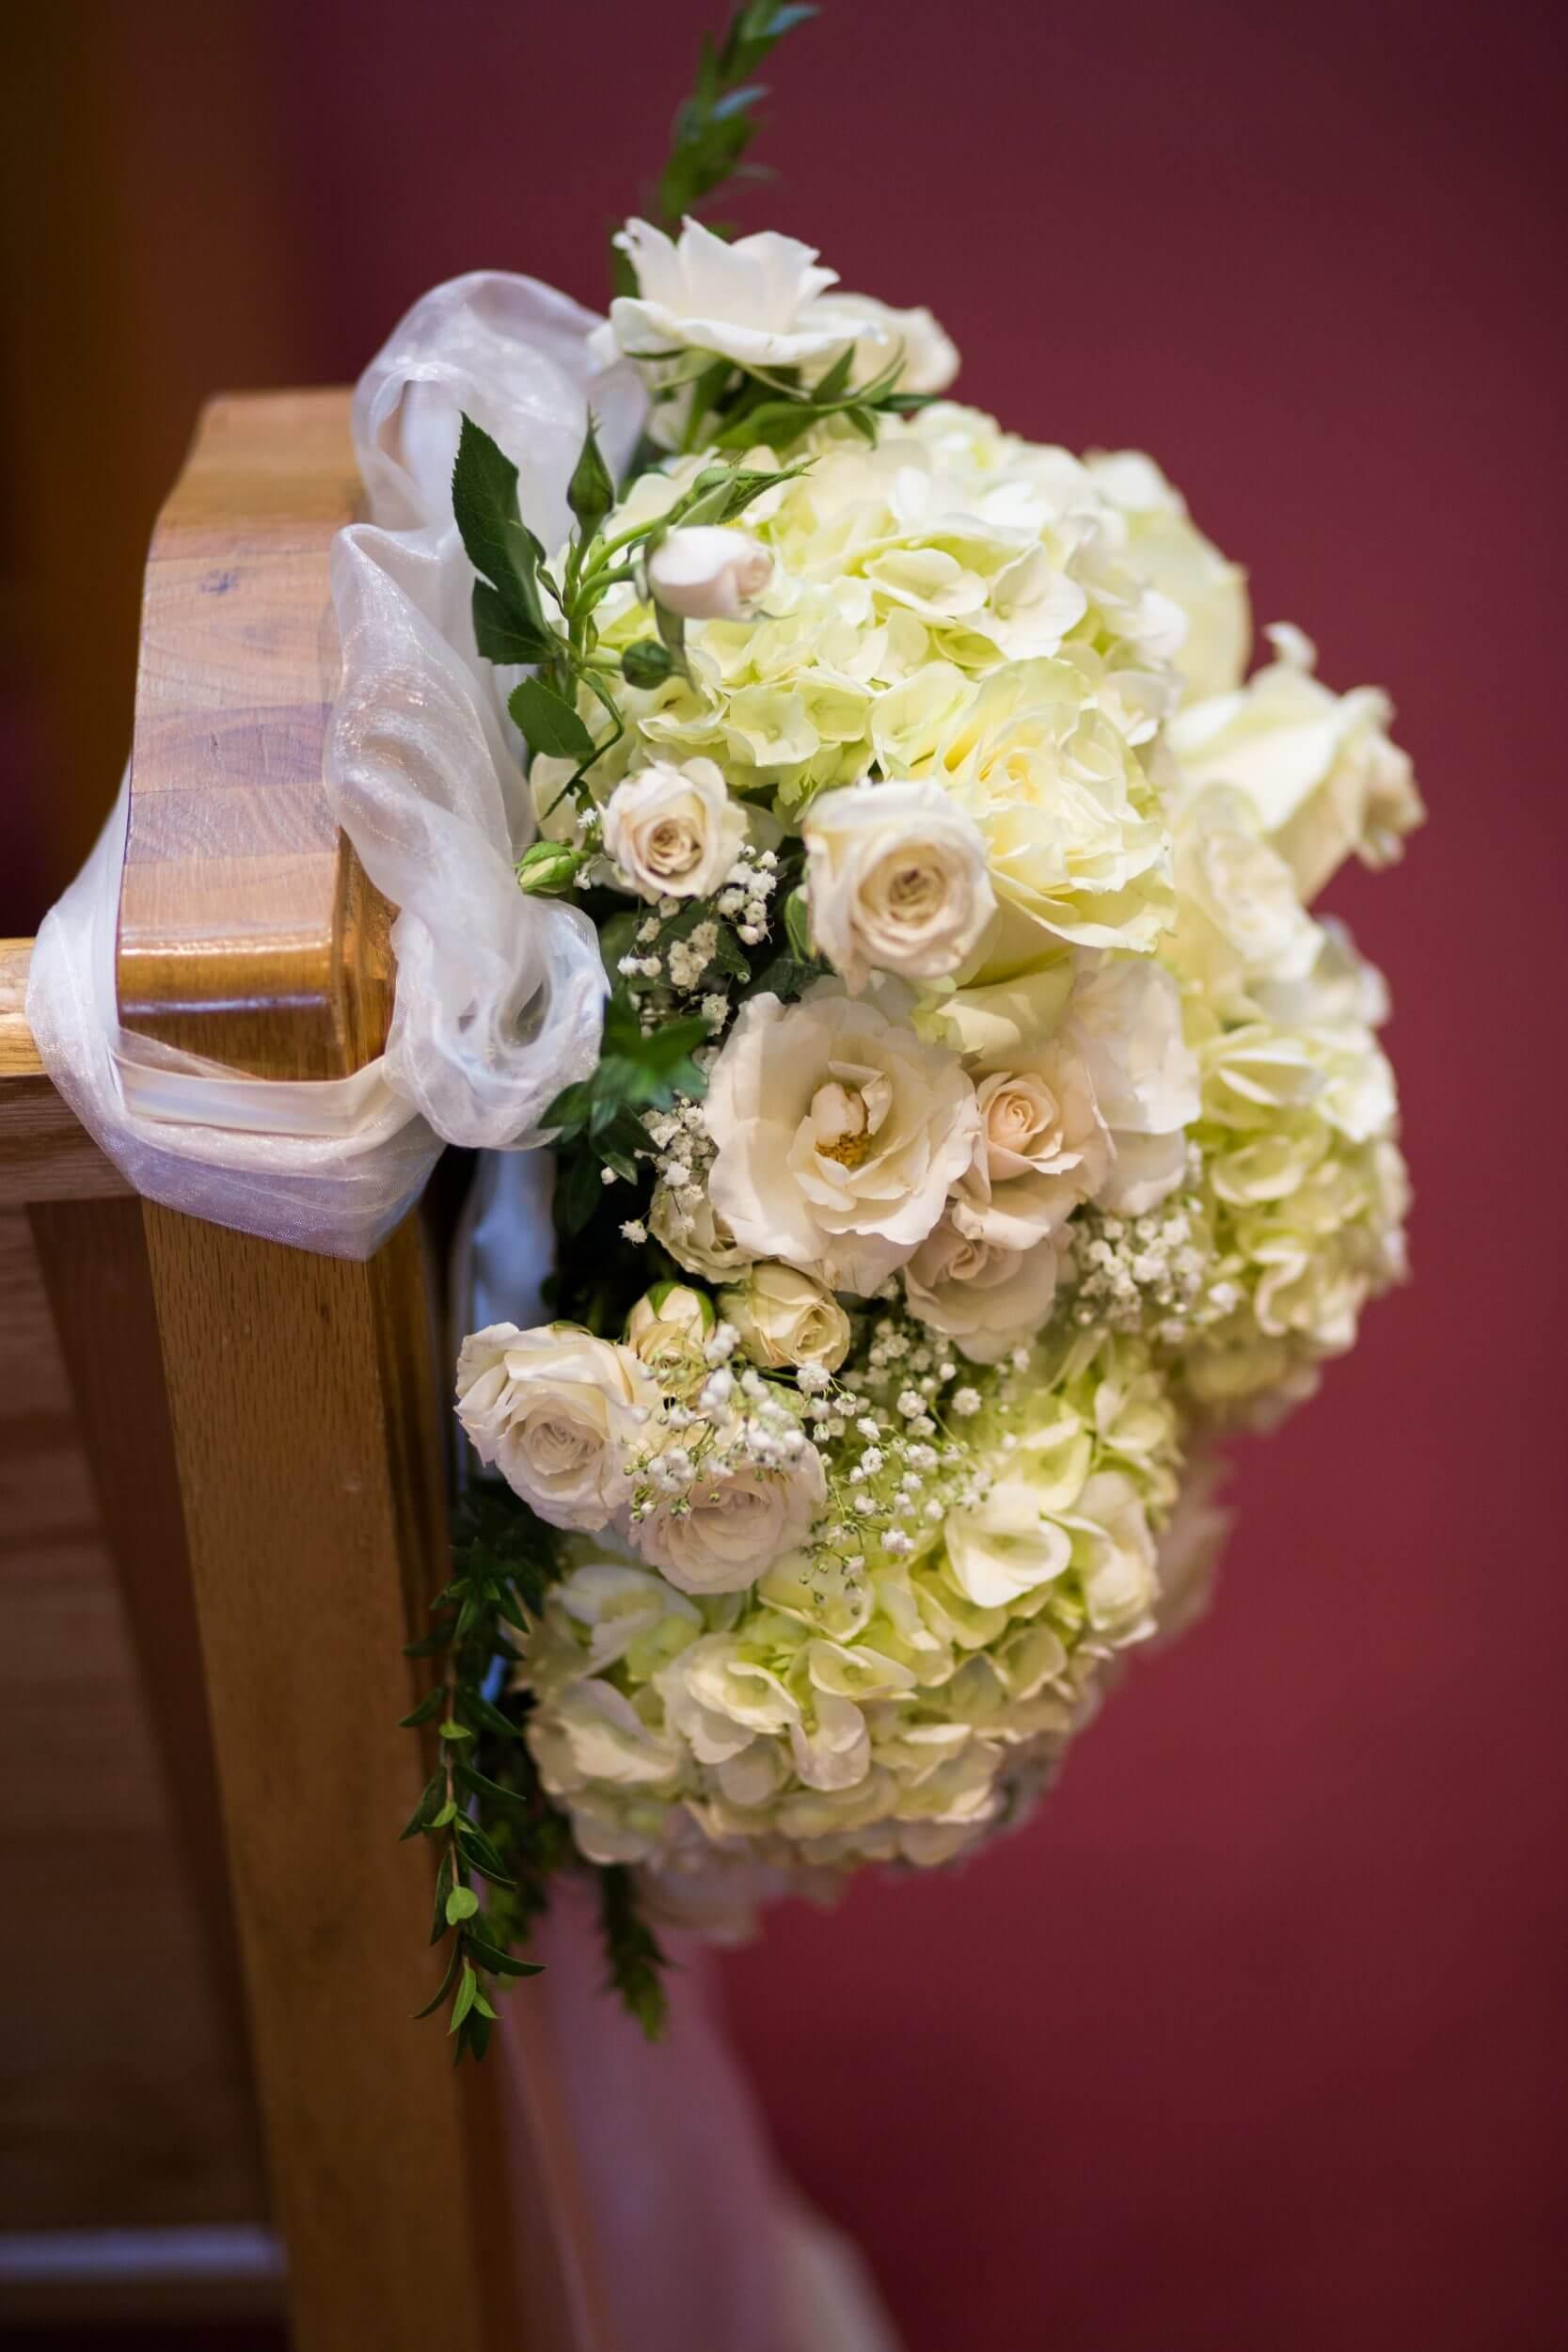 Wedding gallery steves floral location izmirmasajfo